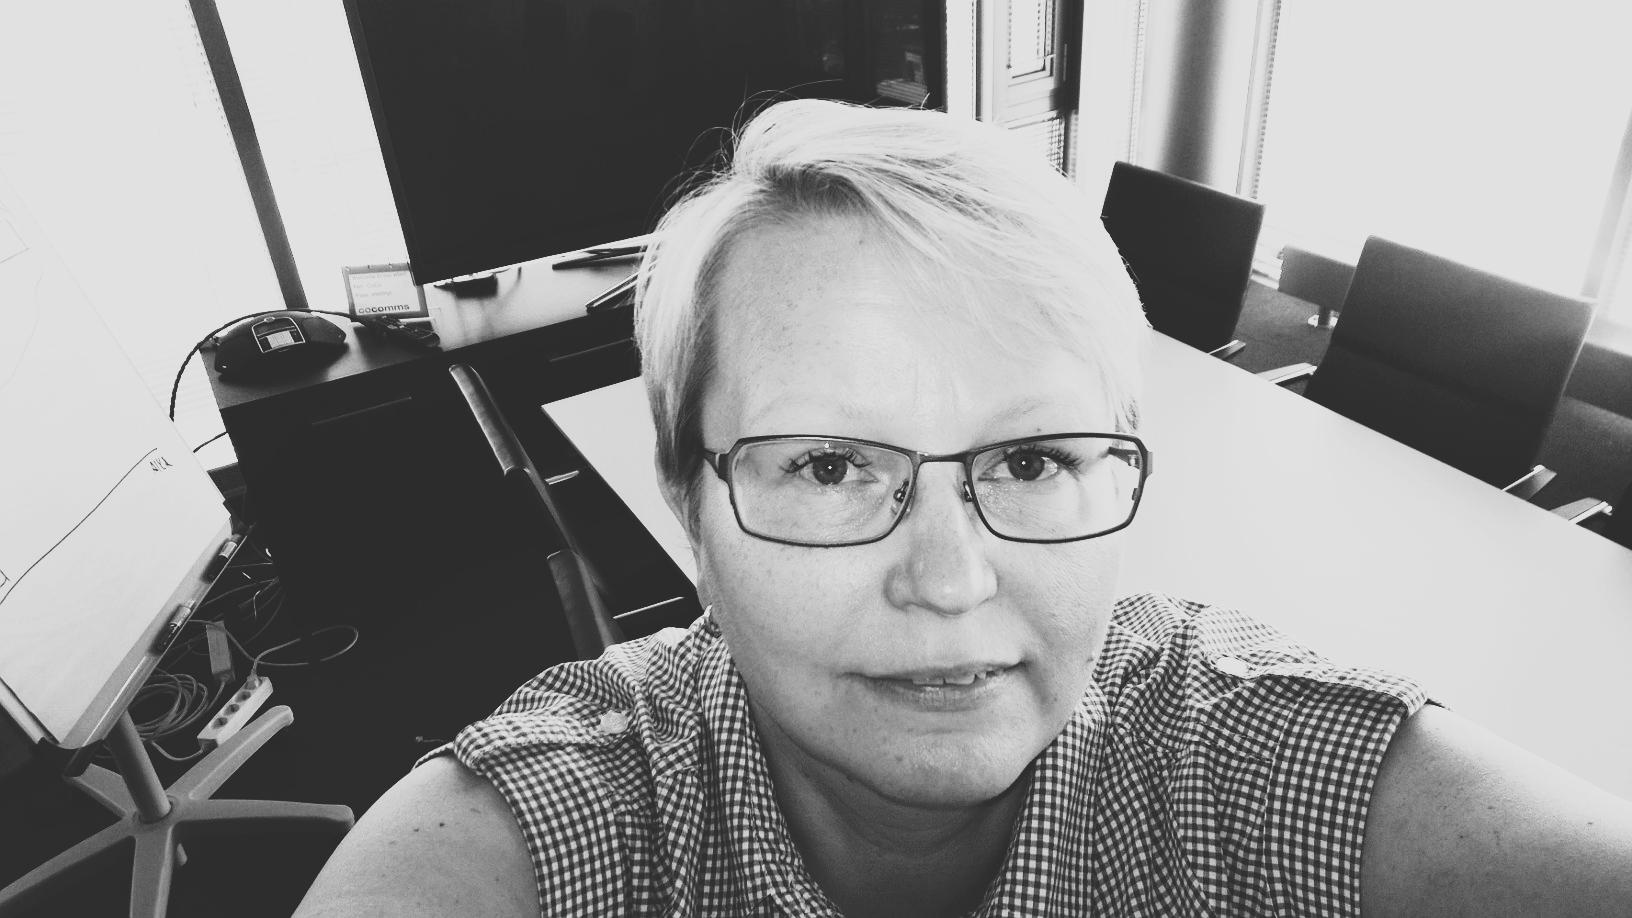 https://cocomms.com/2015/01/22/cocommsin-kielinaiselle-ei-mikaan-pulma-ole-liian-kipera/